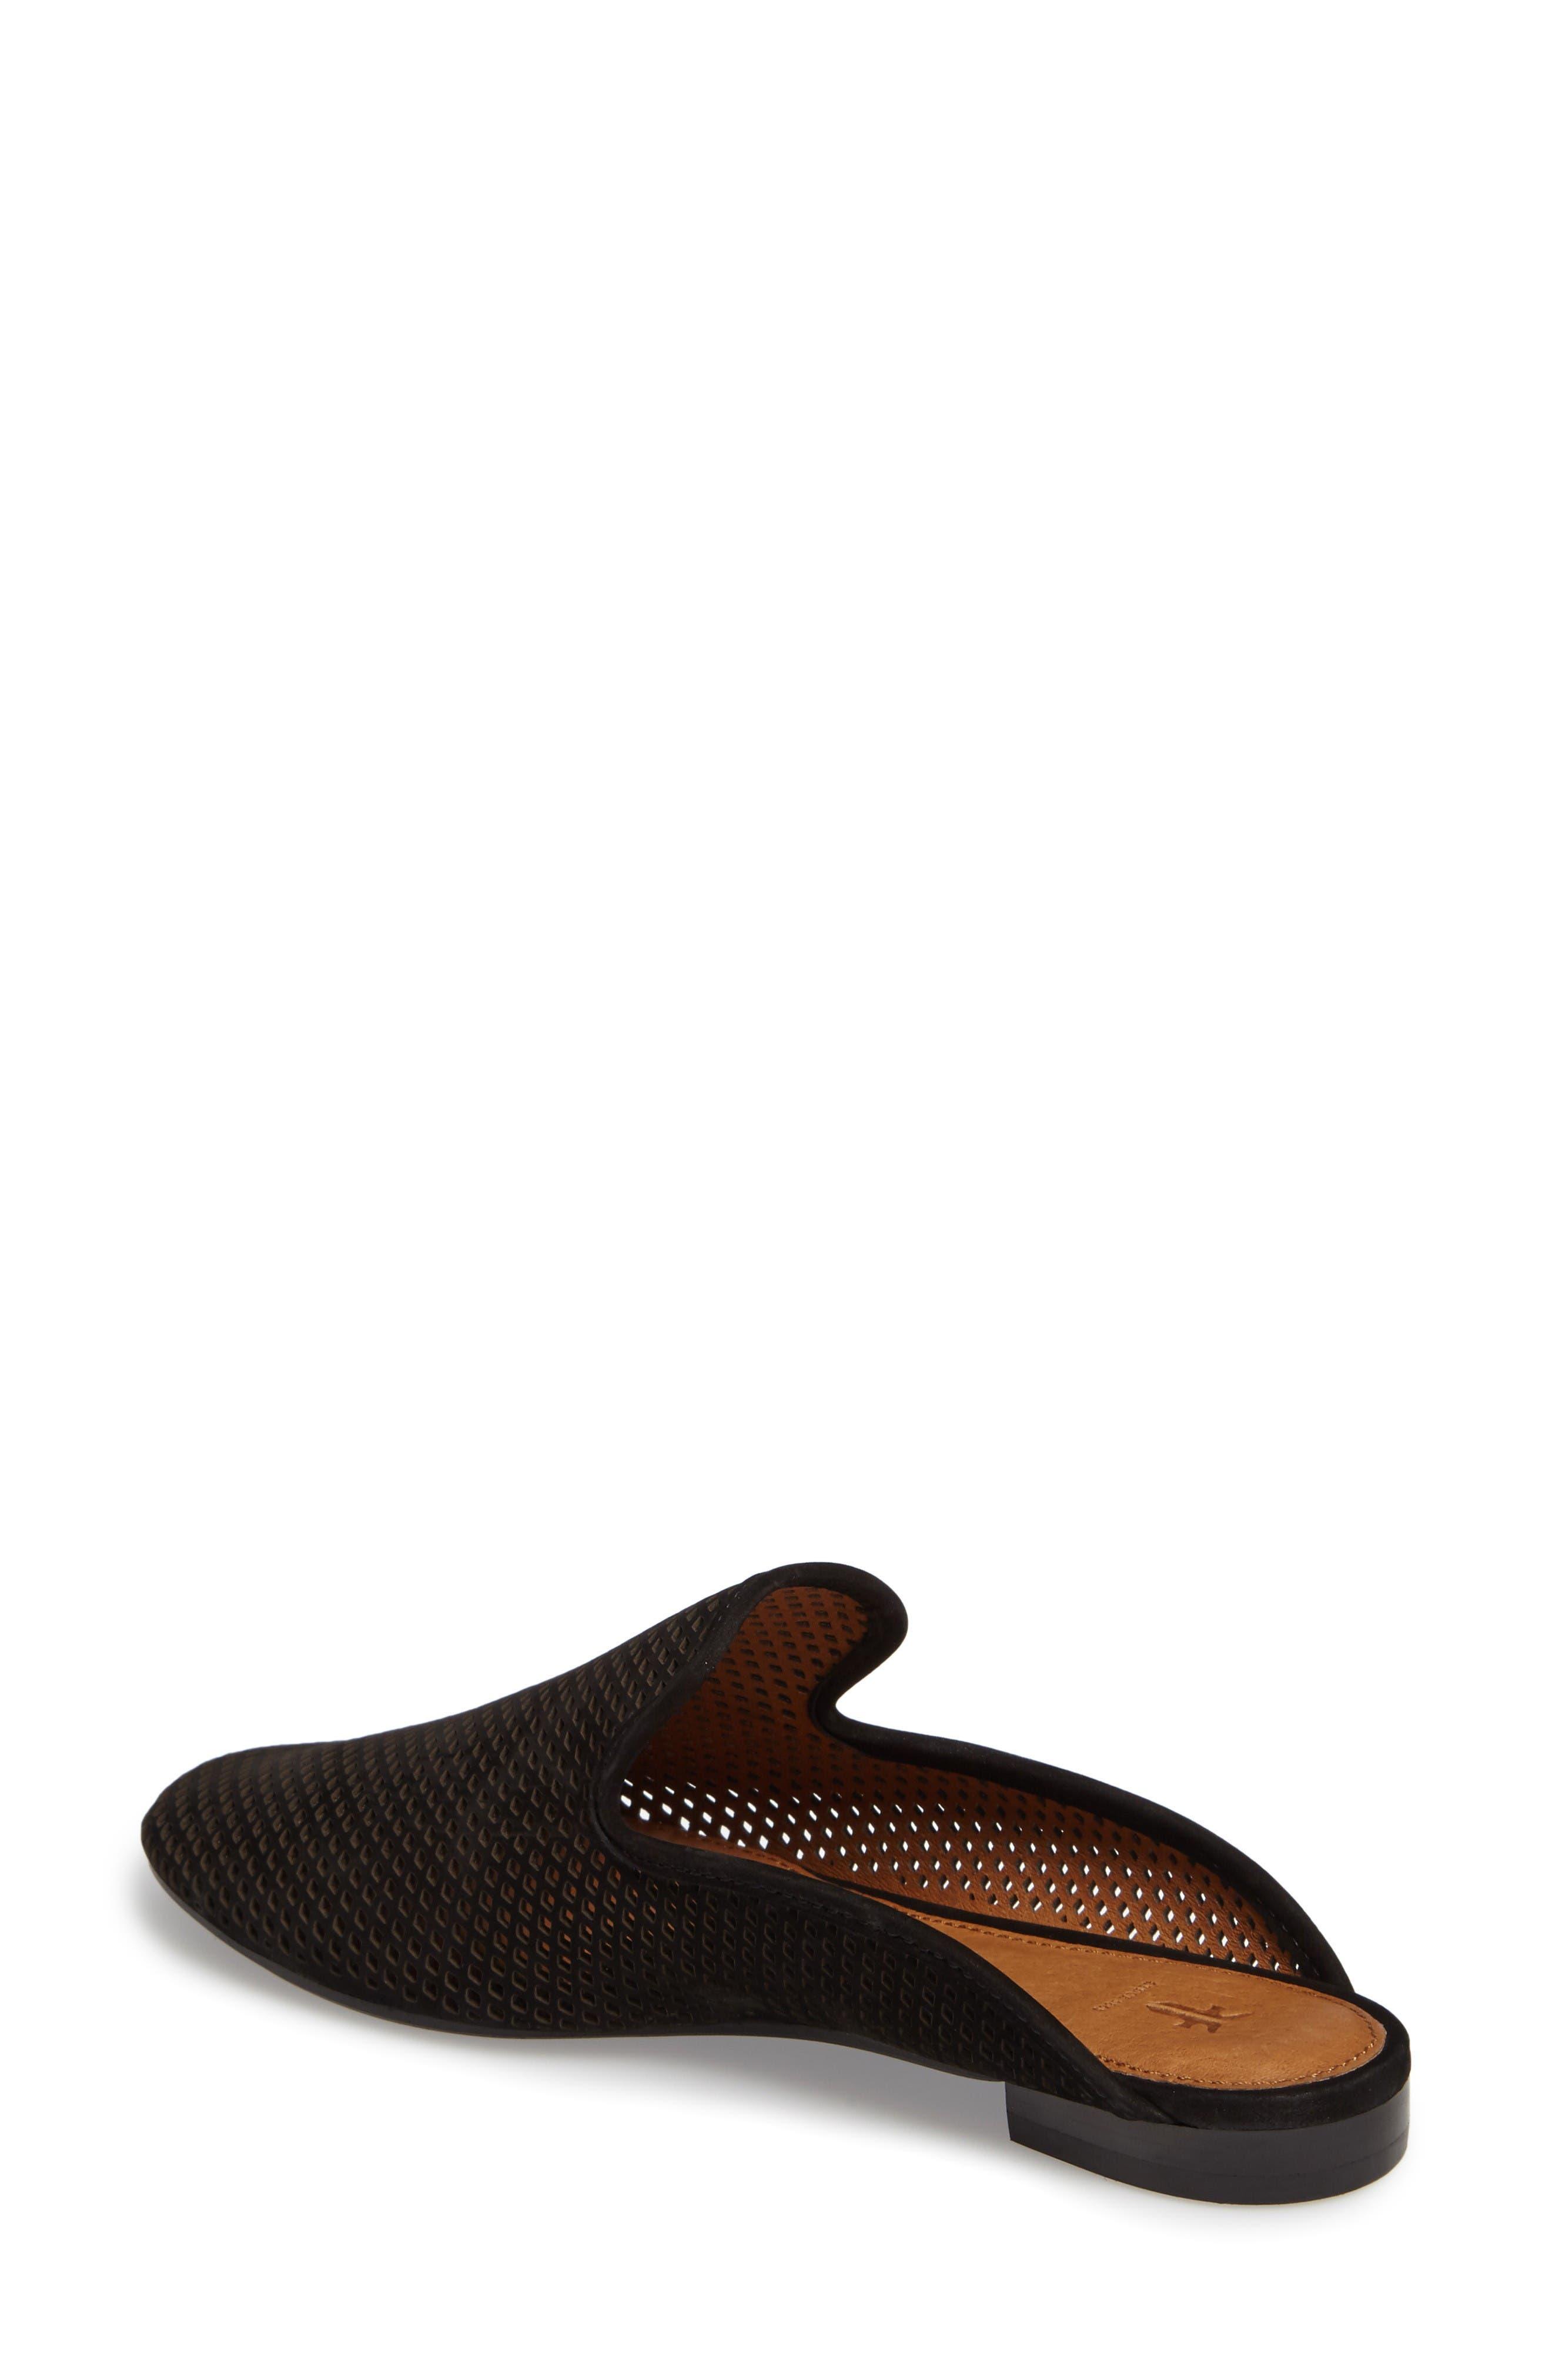 Gwen Perforated Mule,                             Alternate thumbnail 2, color,                             Black Nubuck Leather